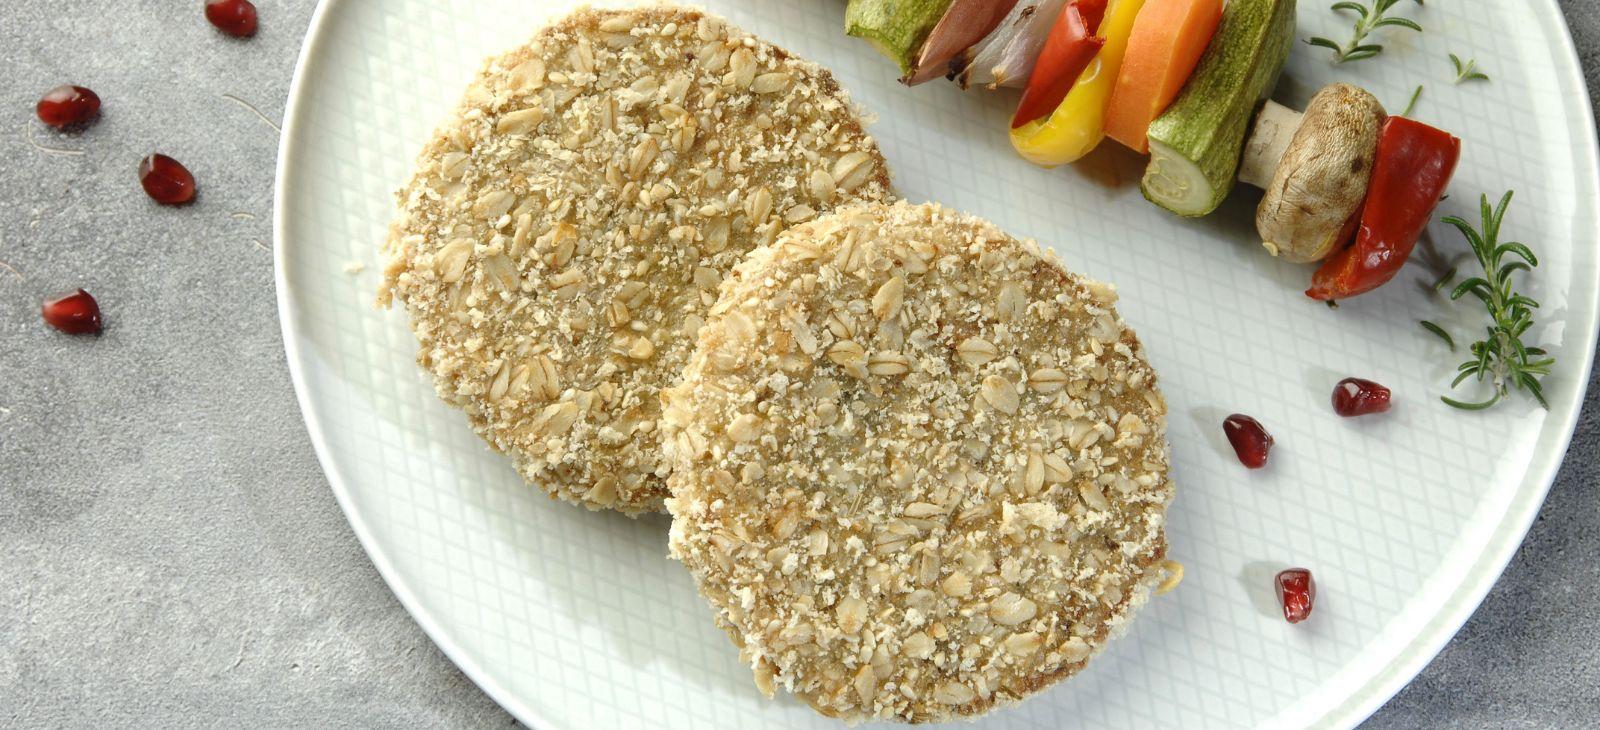 Crispy μπιφτέκι λαχανικών-superfoods